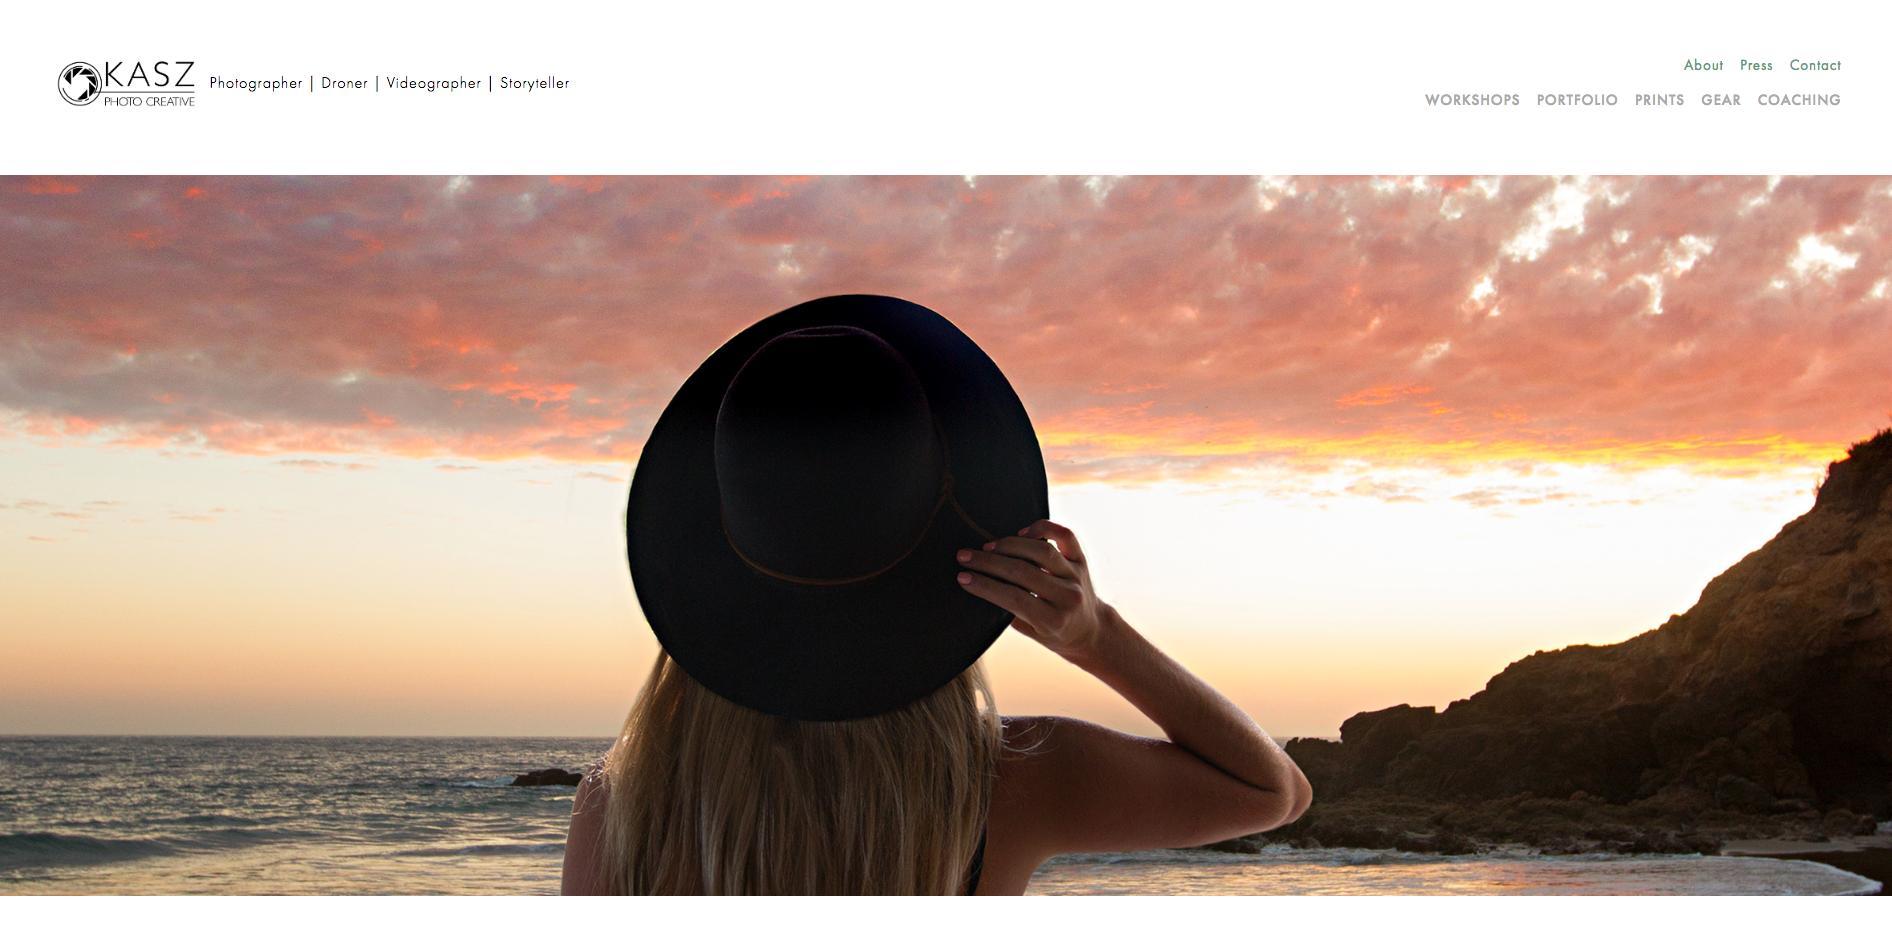 Kasz Photo Creative - New Website & Brand Strategy